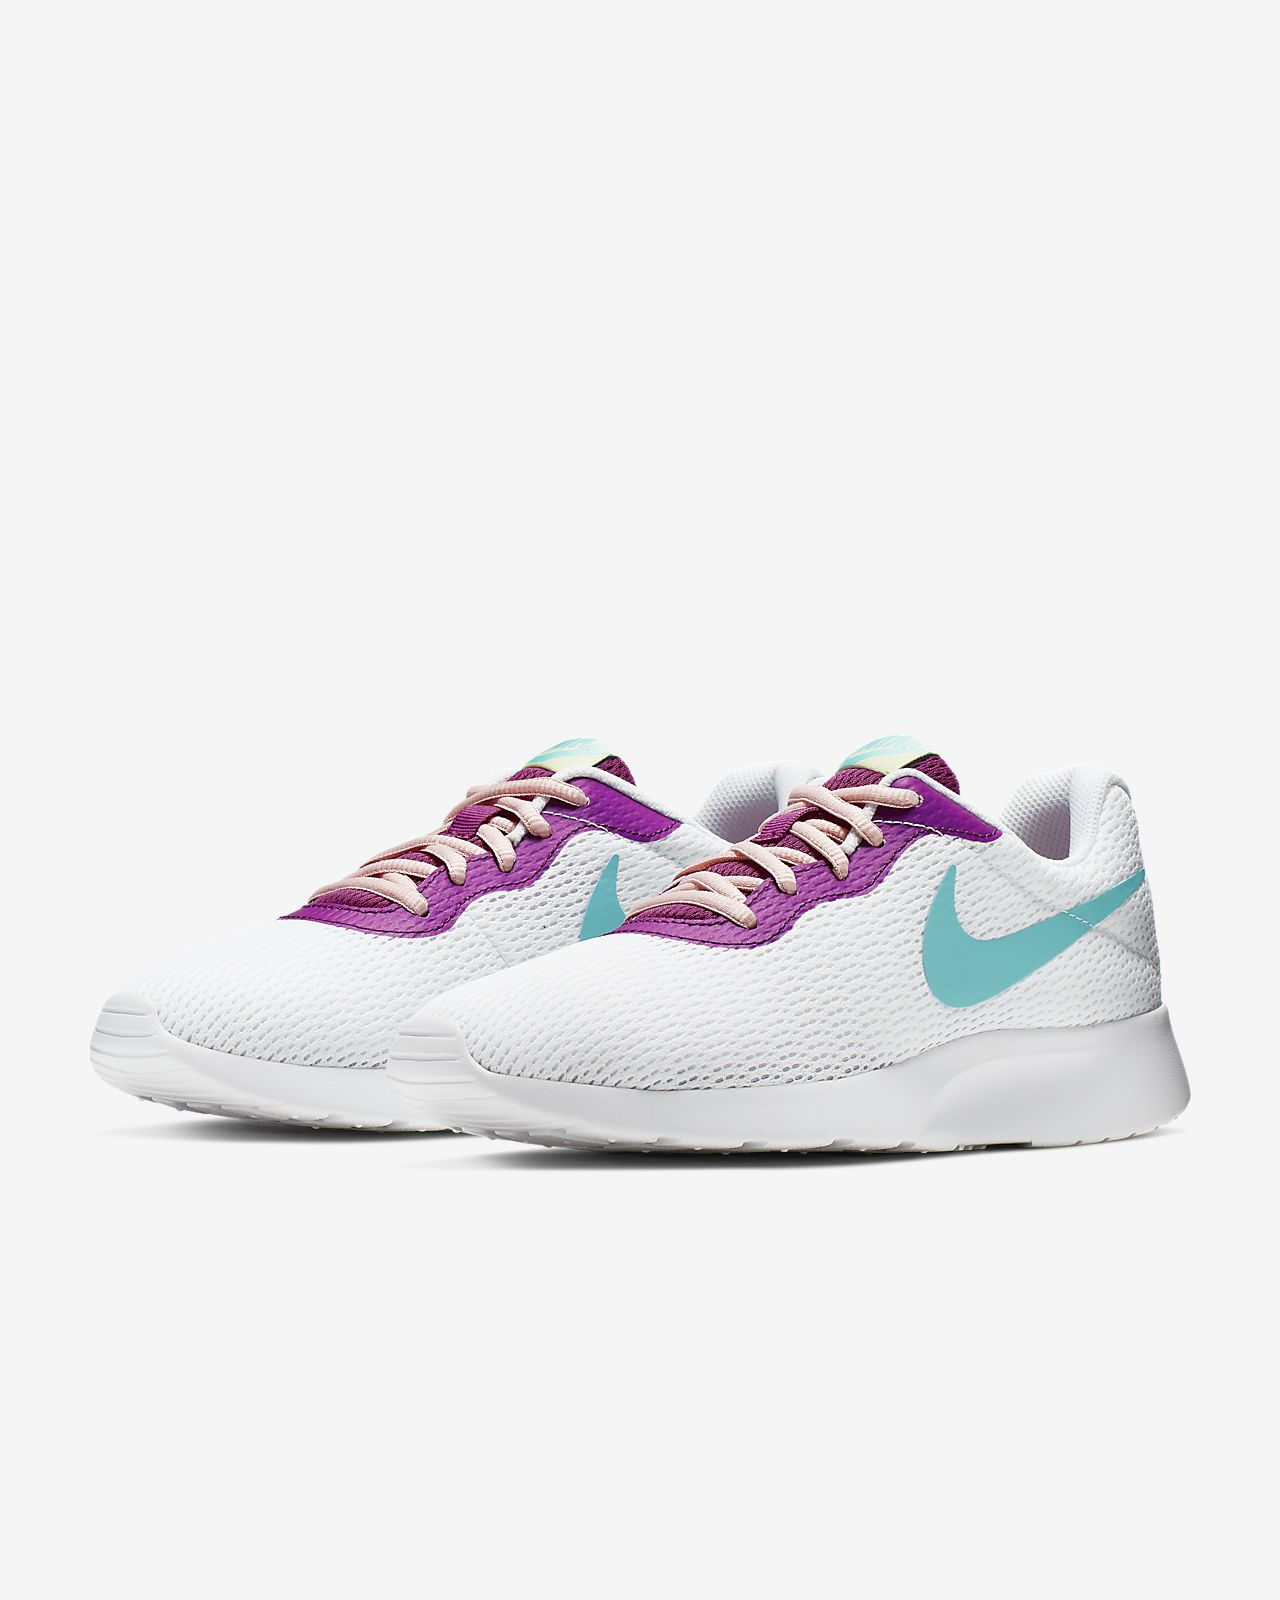 83a9f75ae30 Low Resolution Nike Tanjun Women's Shoe Nike Tanjun Women's Shoe